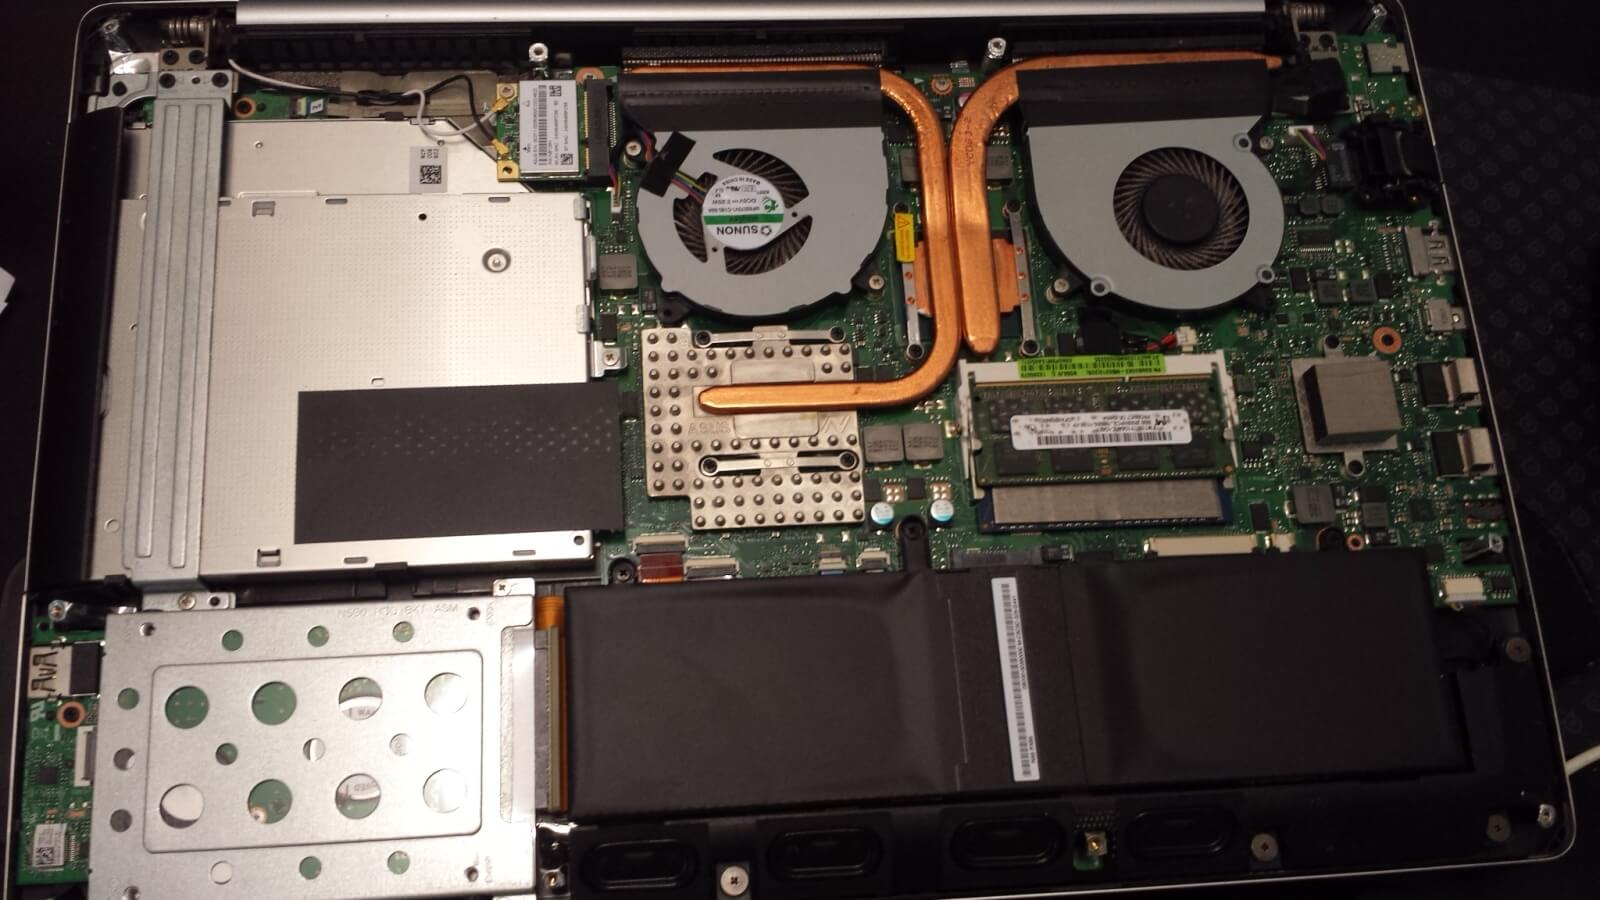 Inside the Asus N550JV laptop (opening)